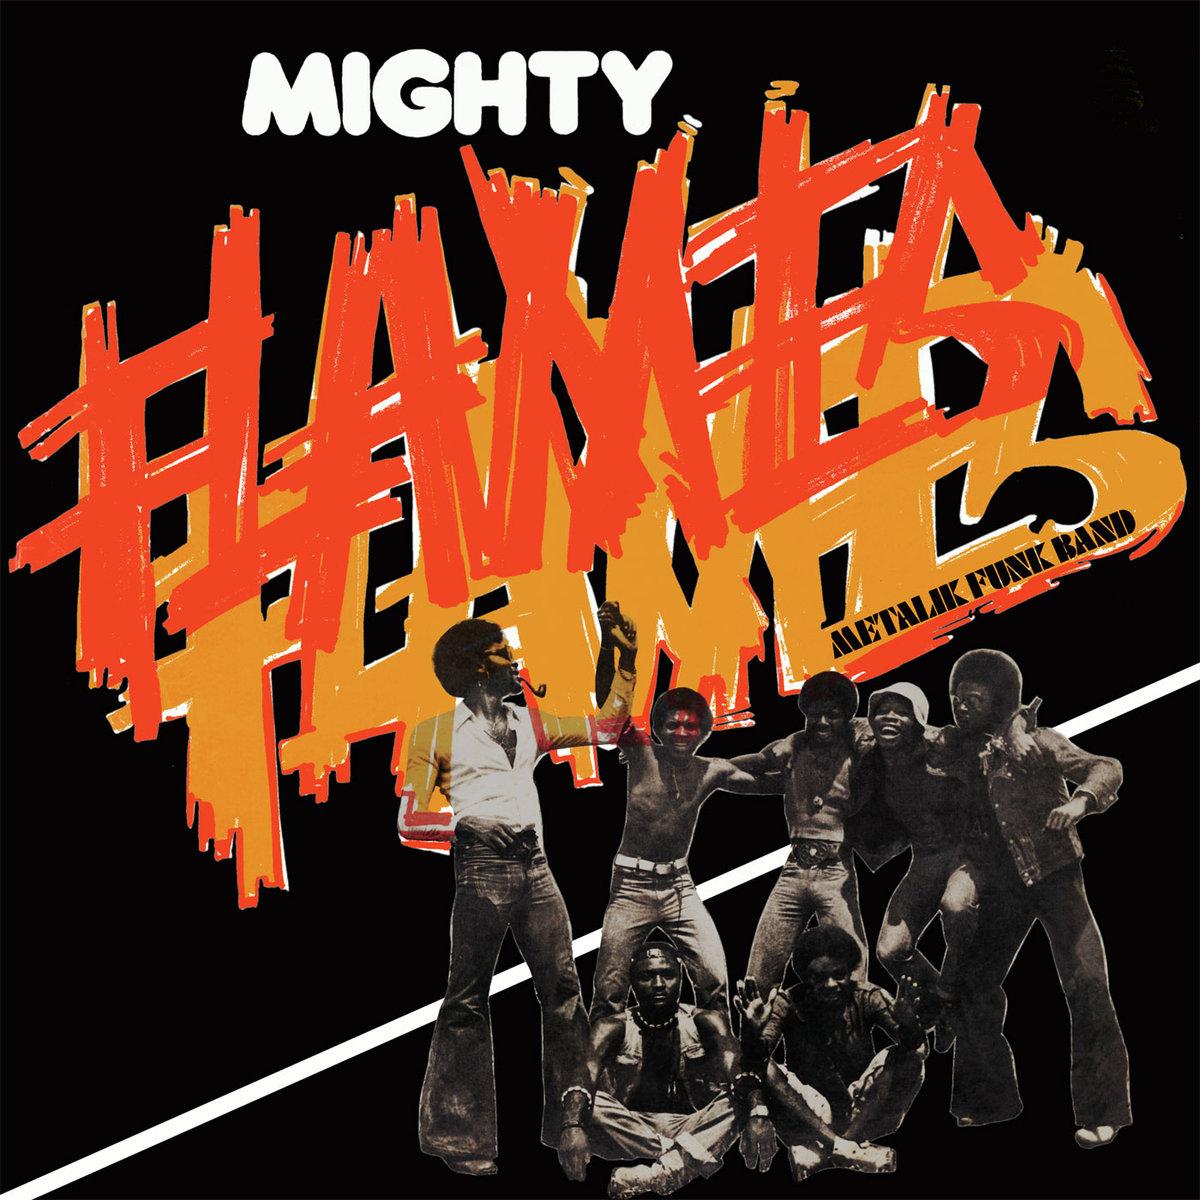 Austria PMG переиздаст ключевой альбом забытых героев афрофанка The Mighty Flames